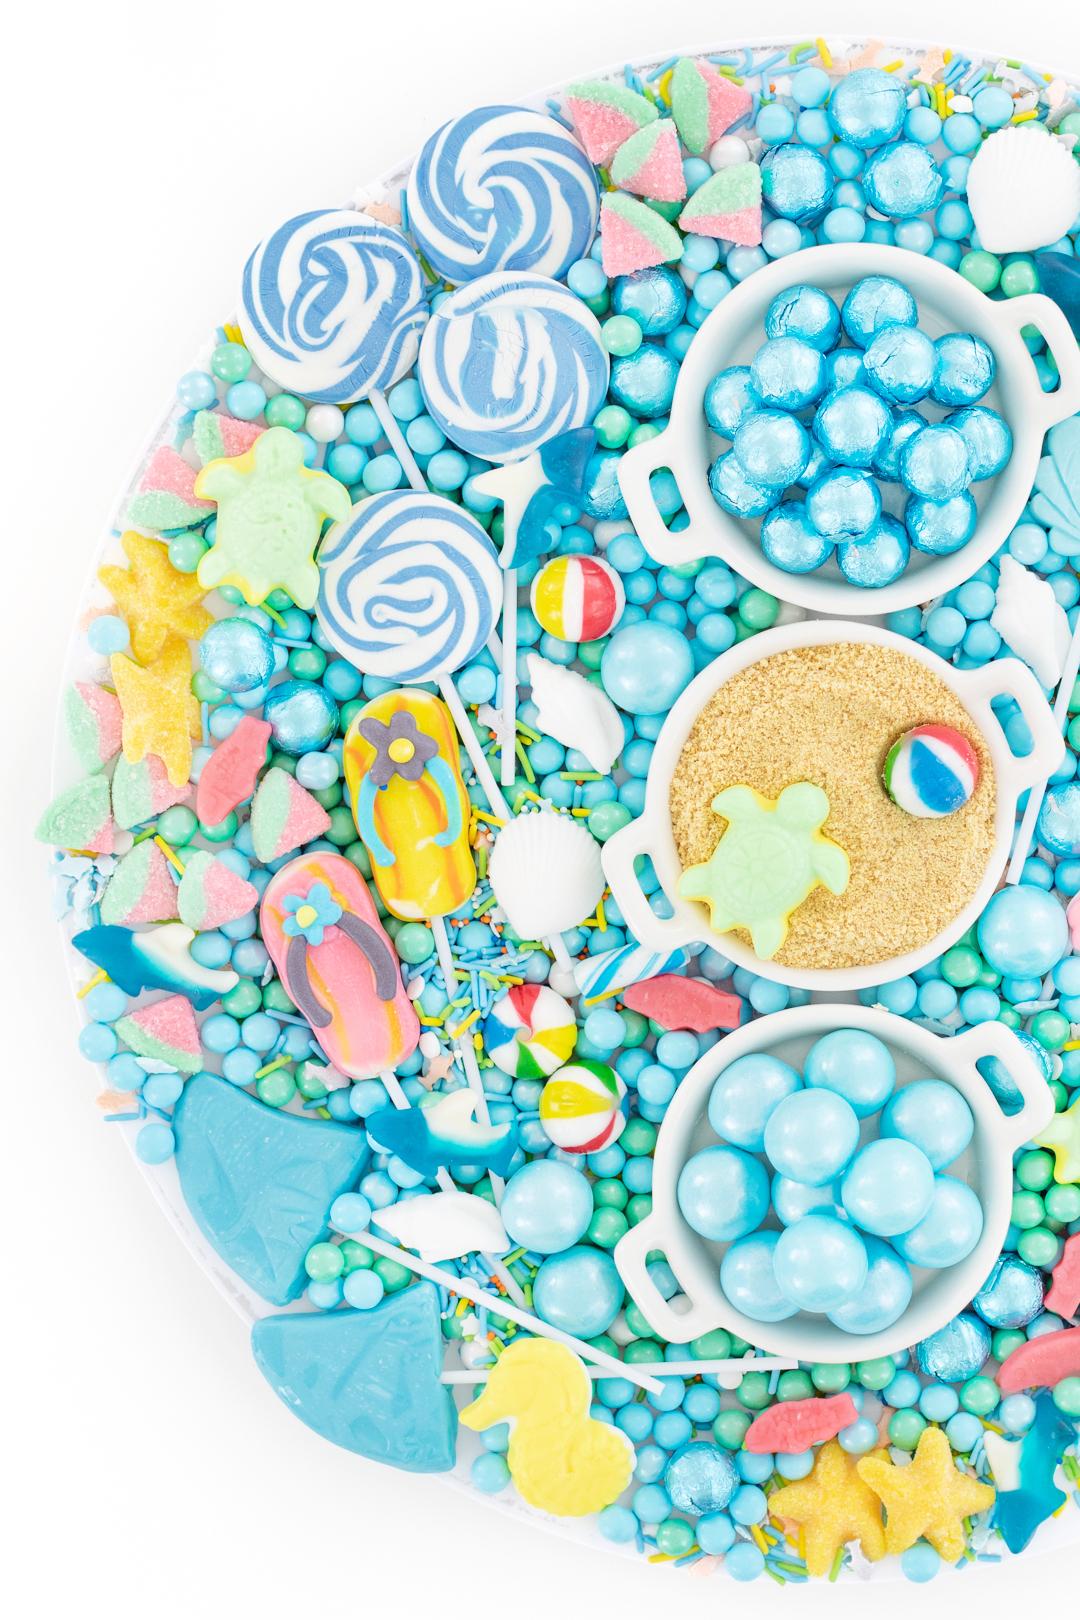 candy platter with a beach theme. flip flop lollipops, sea creature gummy candies